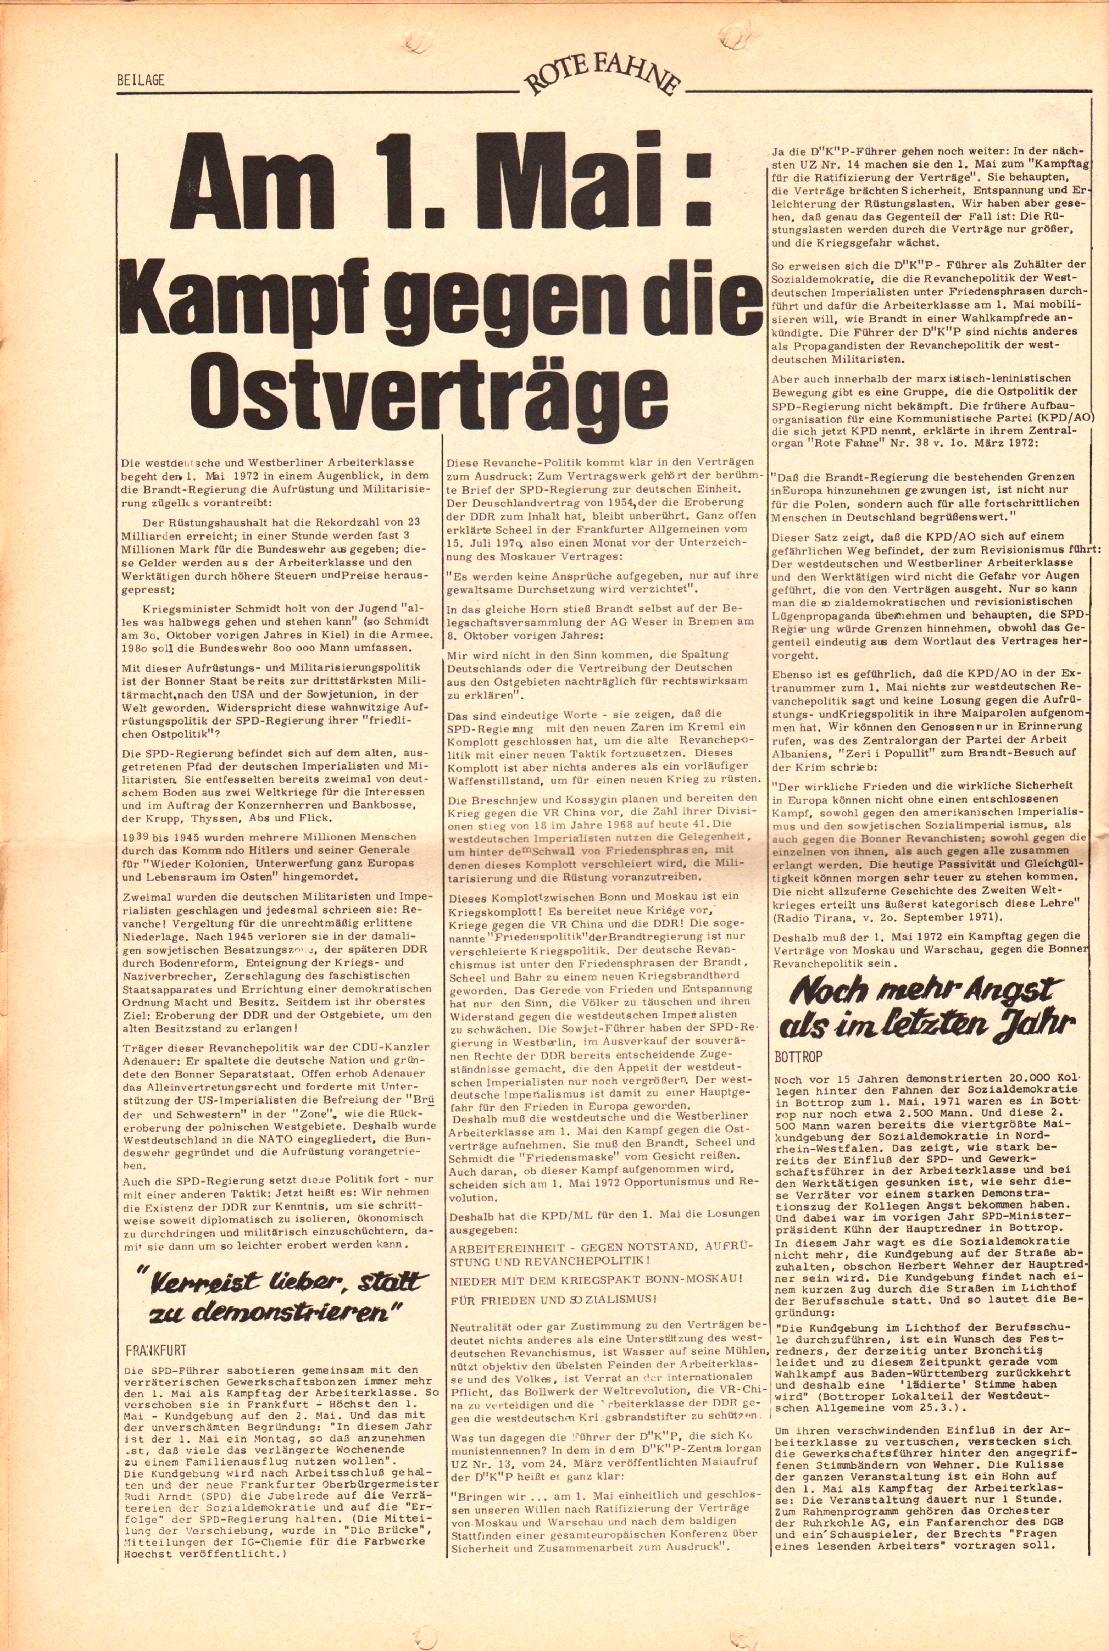 Rote Fahne, 3. Jg., 3.4.1972, Nr. 7, Beilage, Seite 2